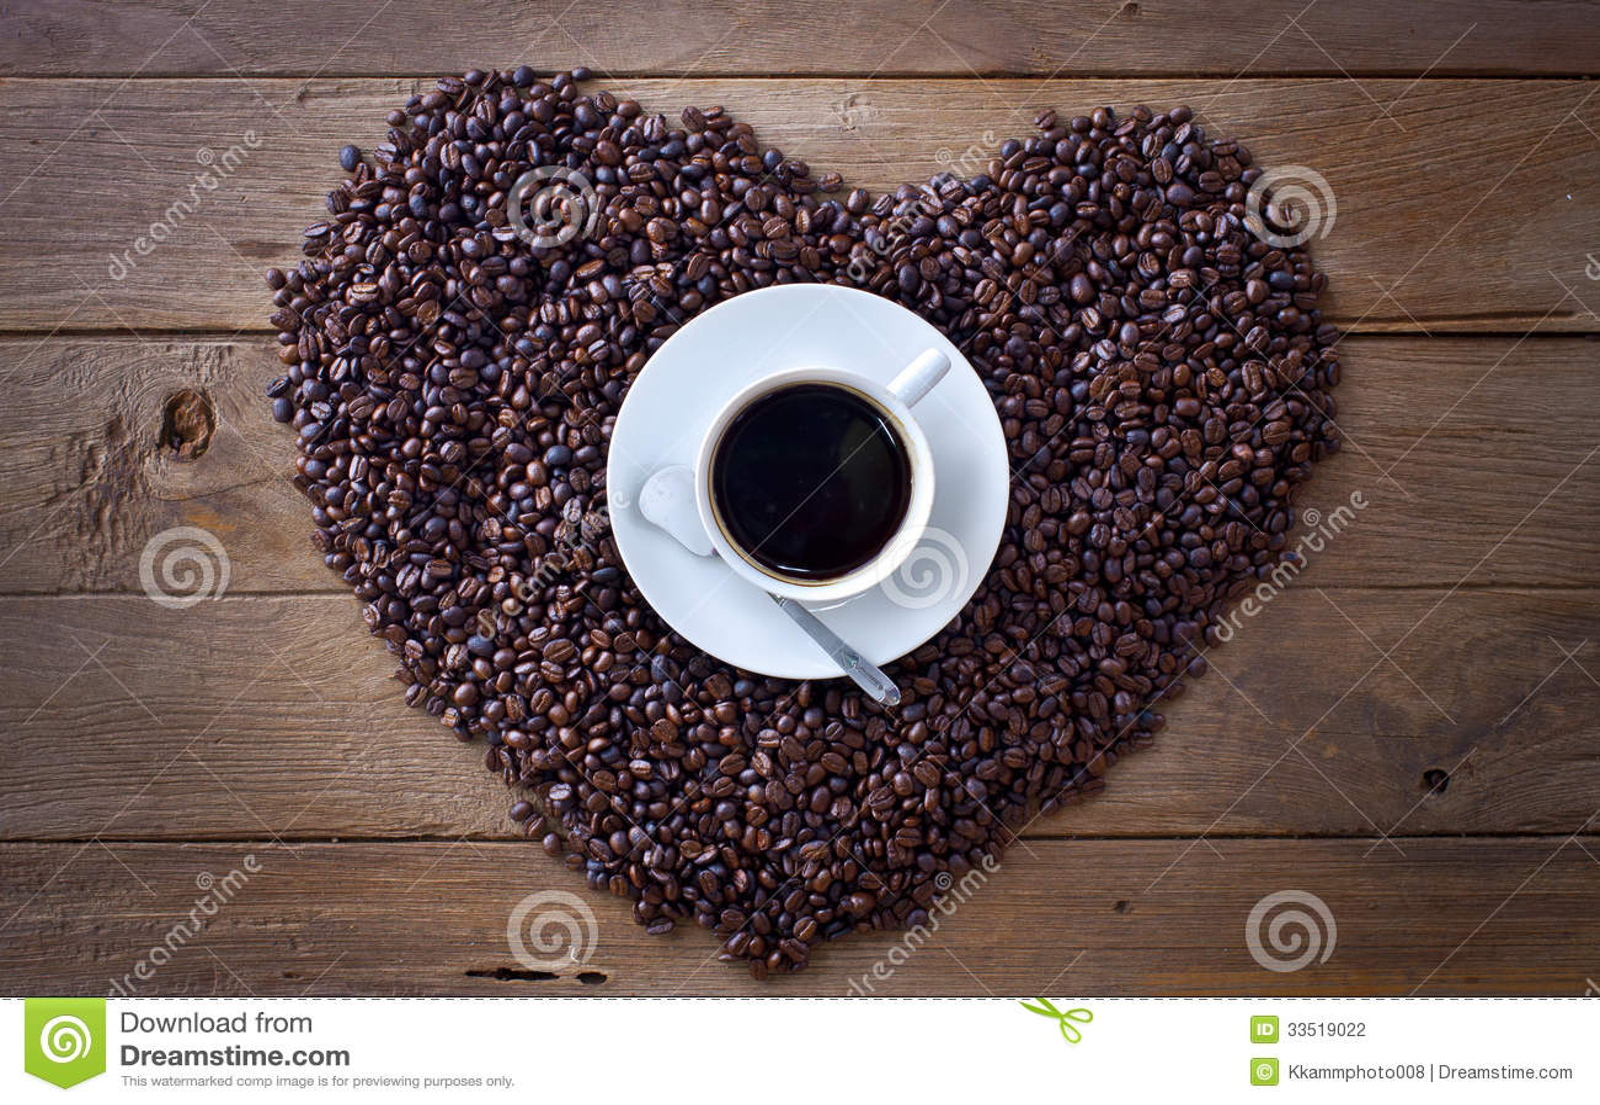 Kaffee beans&Coffee